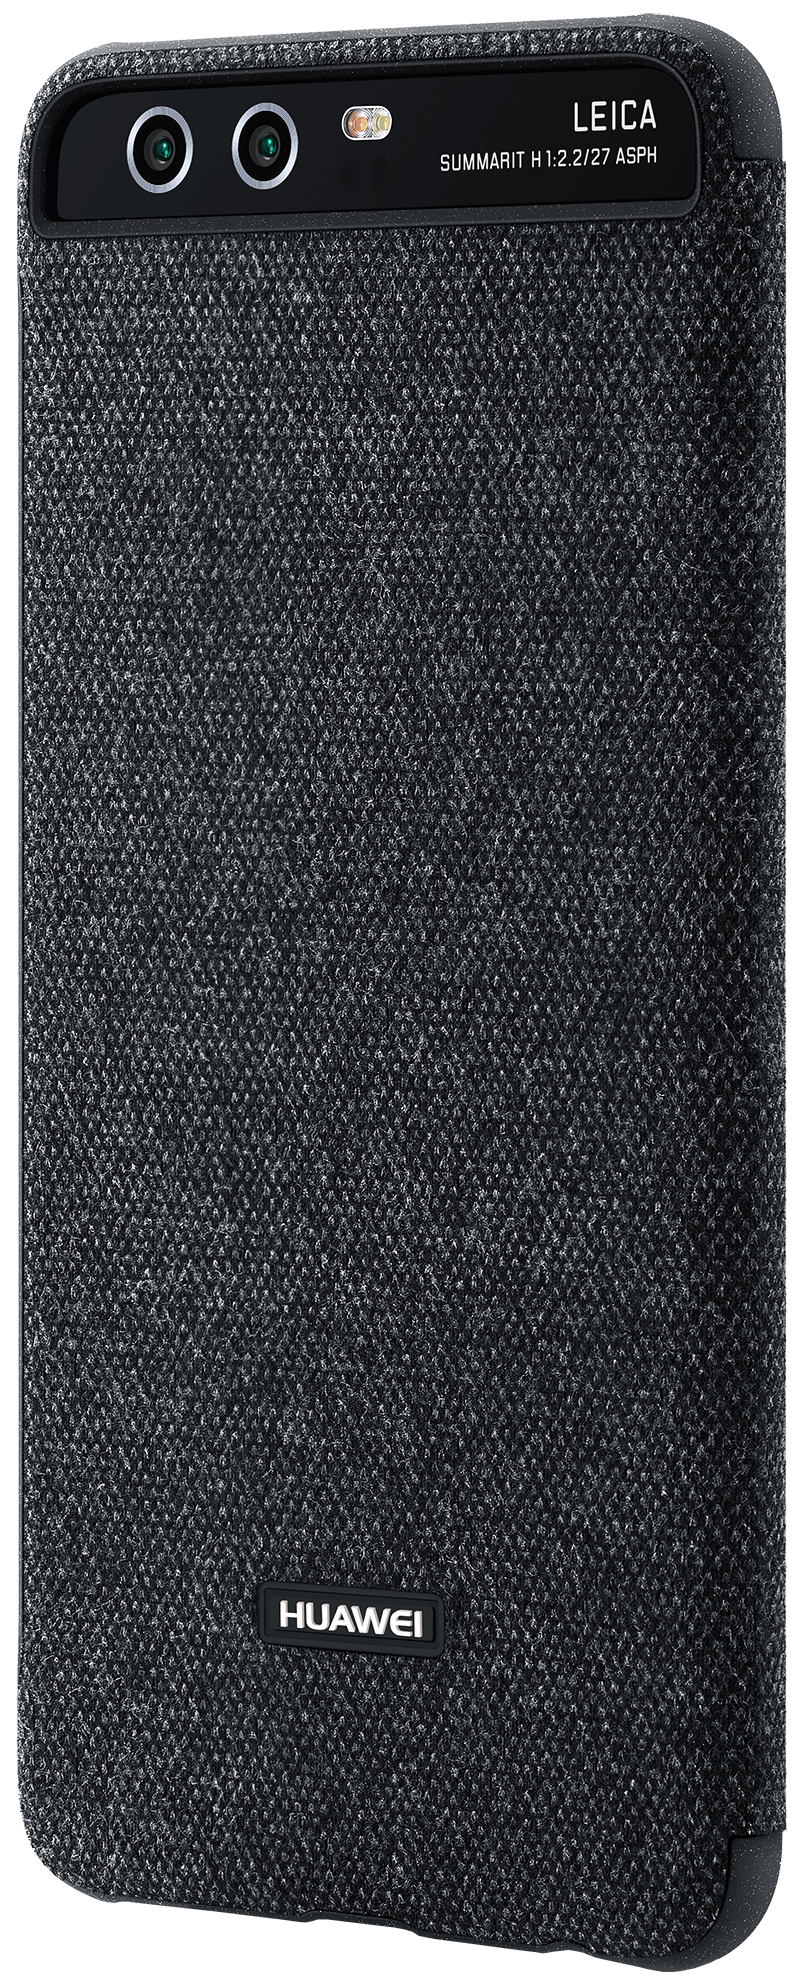 Etui folio Huawei P10 gris